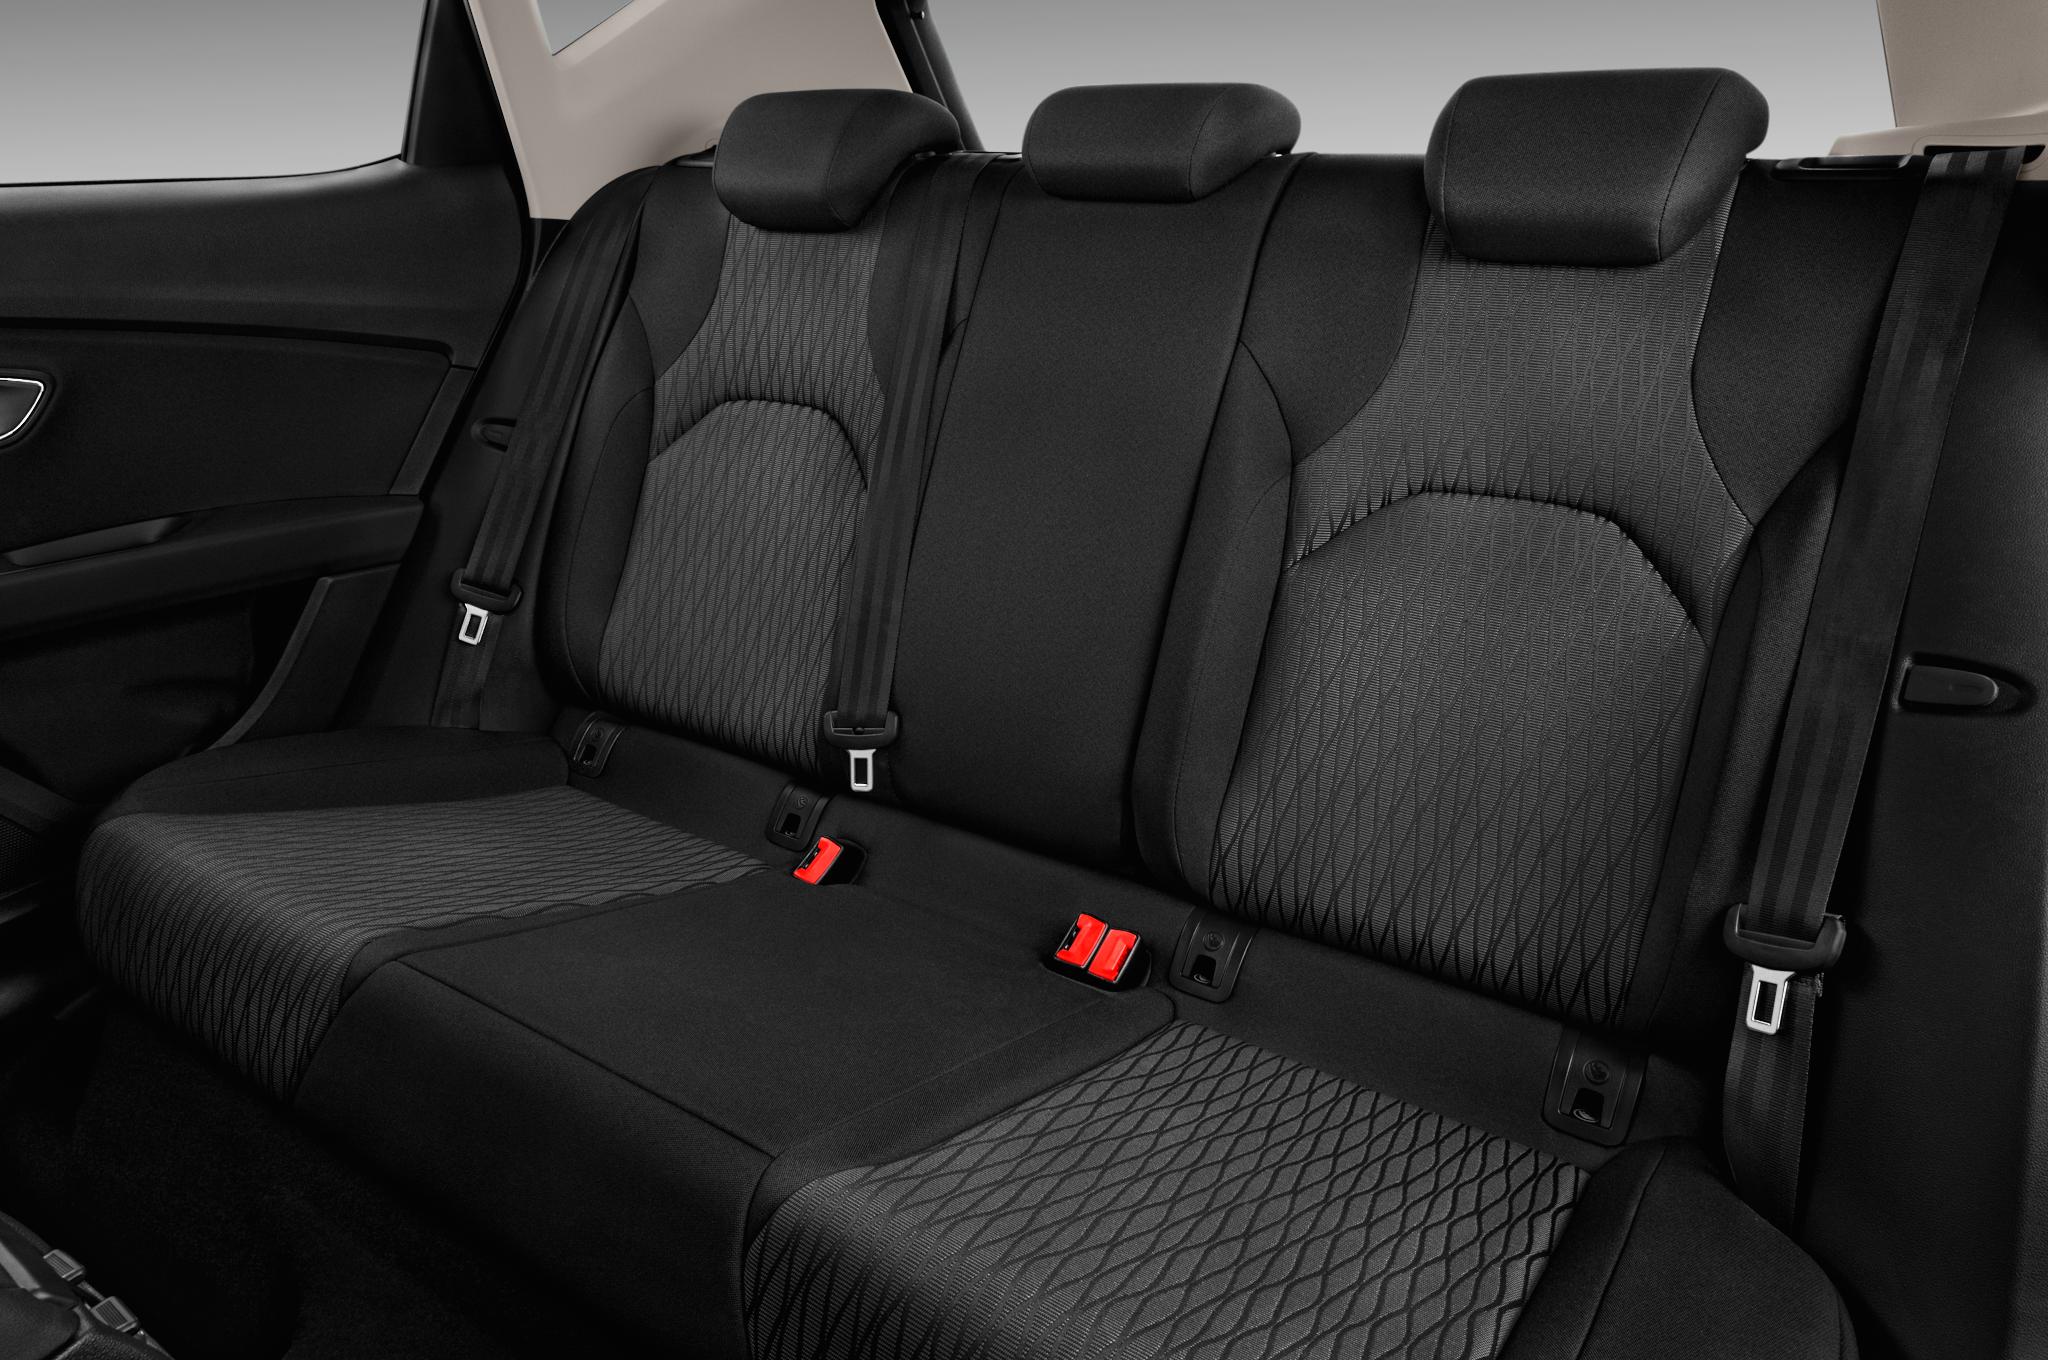 seat leon interior rear seat